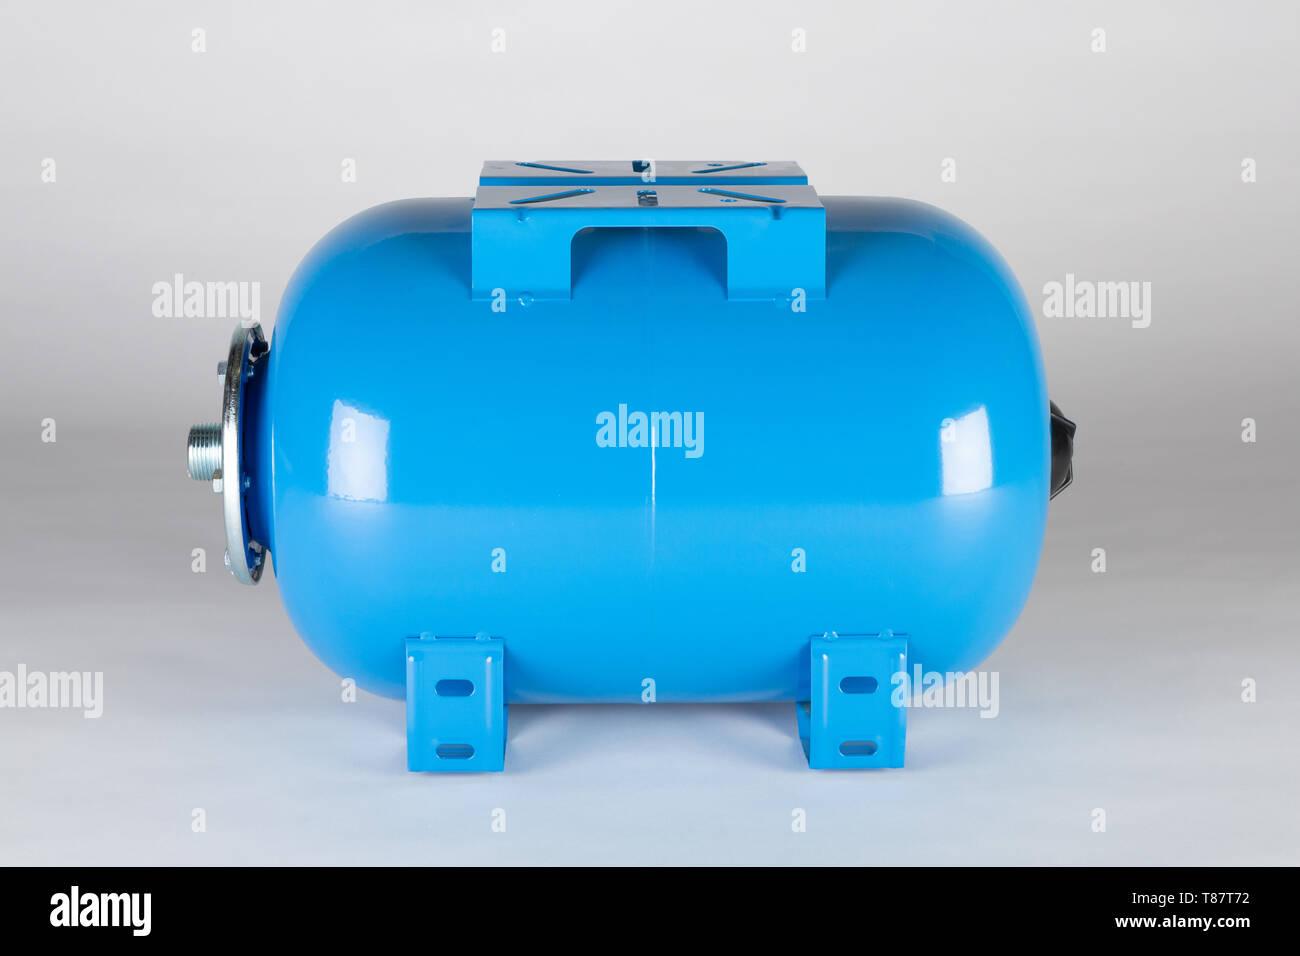 Blue horizontal pressure tank. - Stock Image